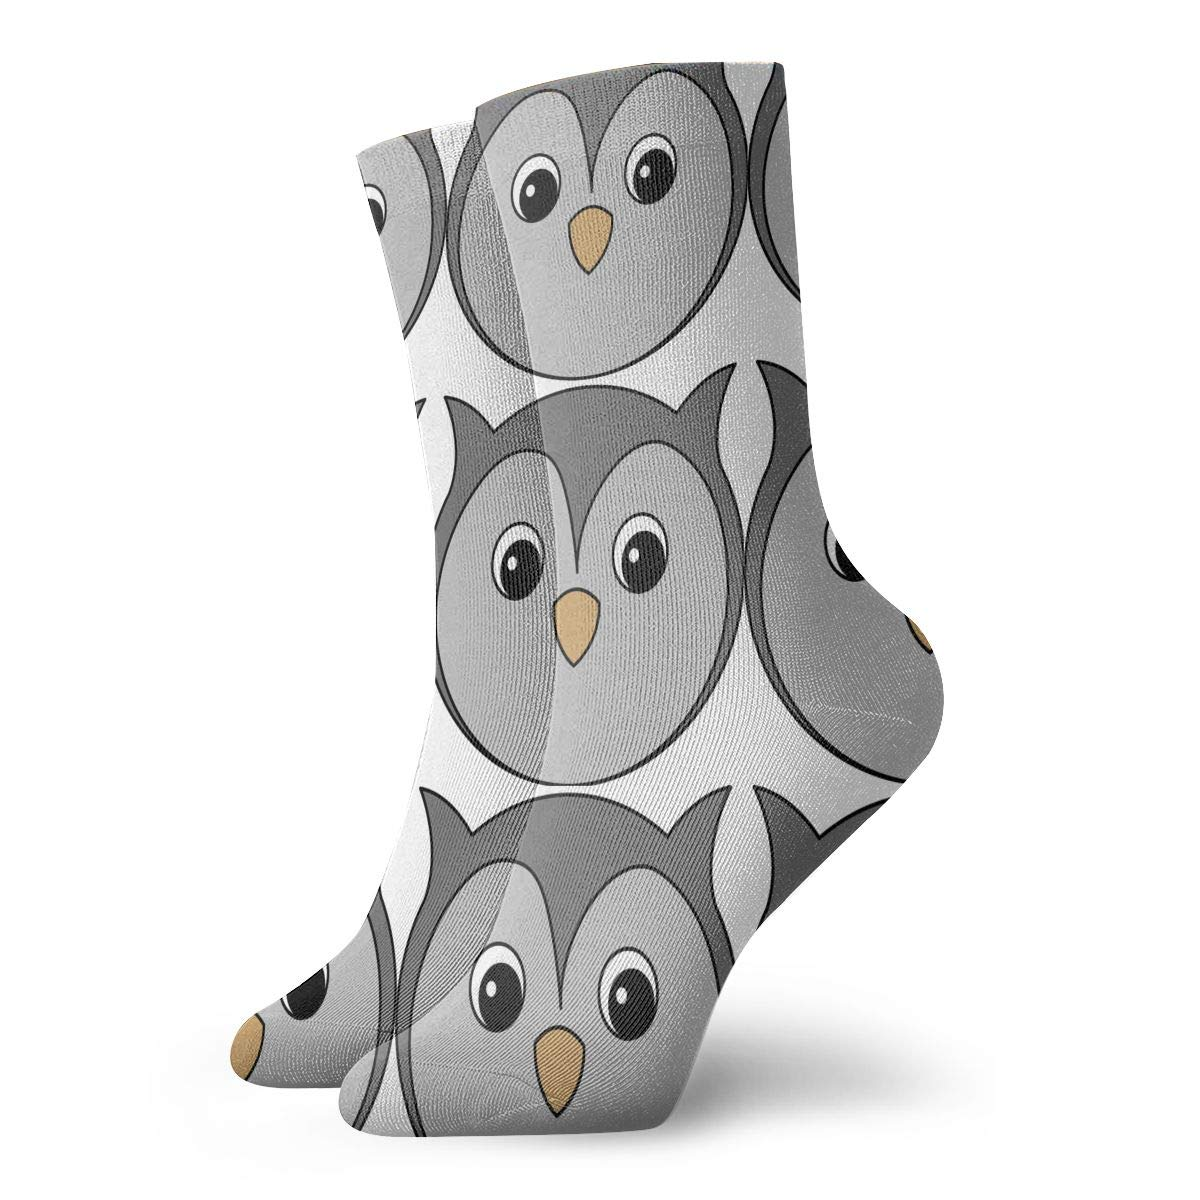 Unisex Cute And Tender Owl Athletic Quarter Ankle Print Breathable Hiking Running Socks